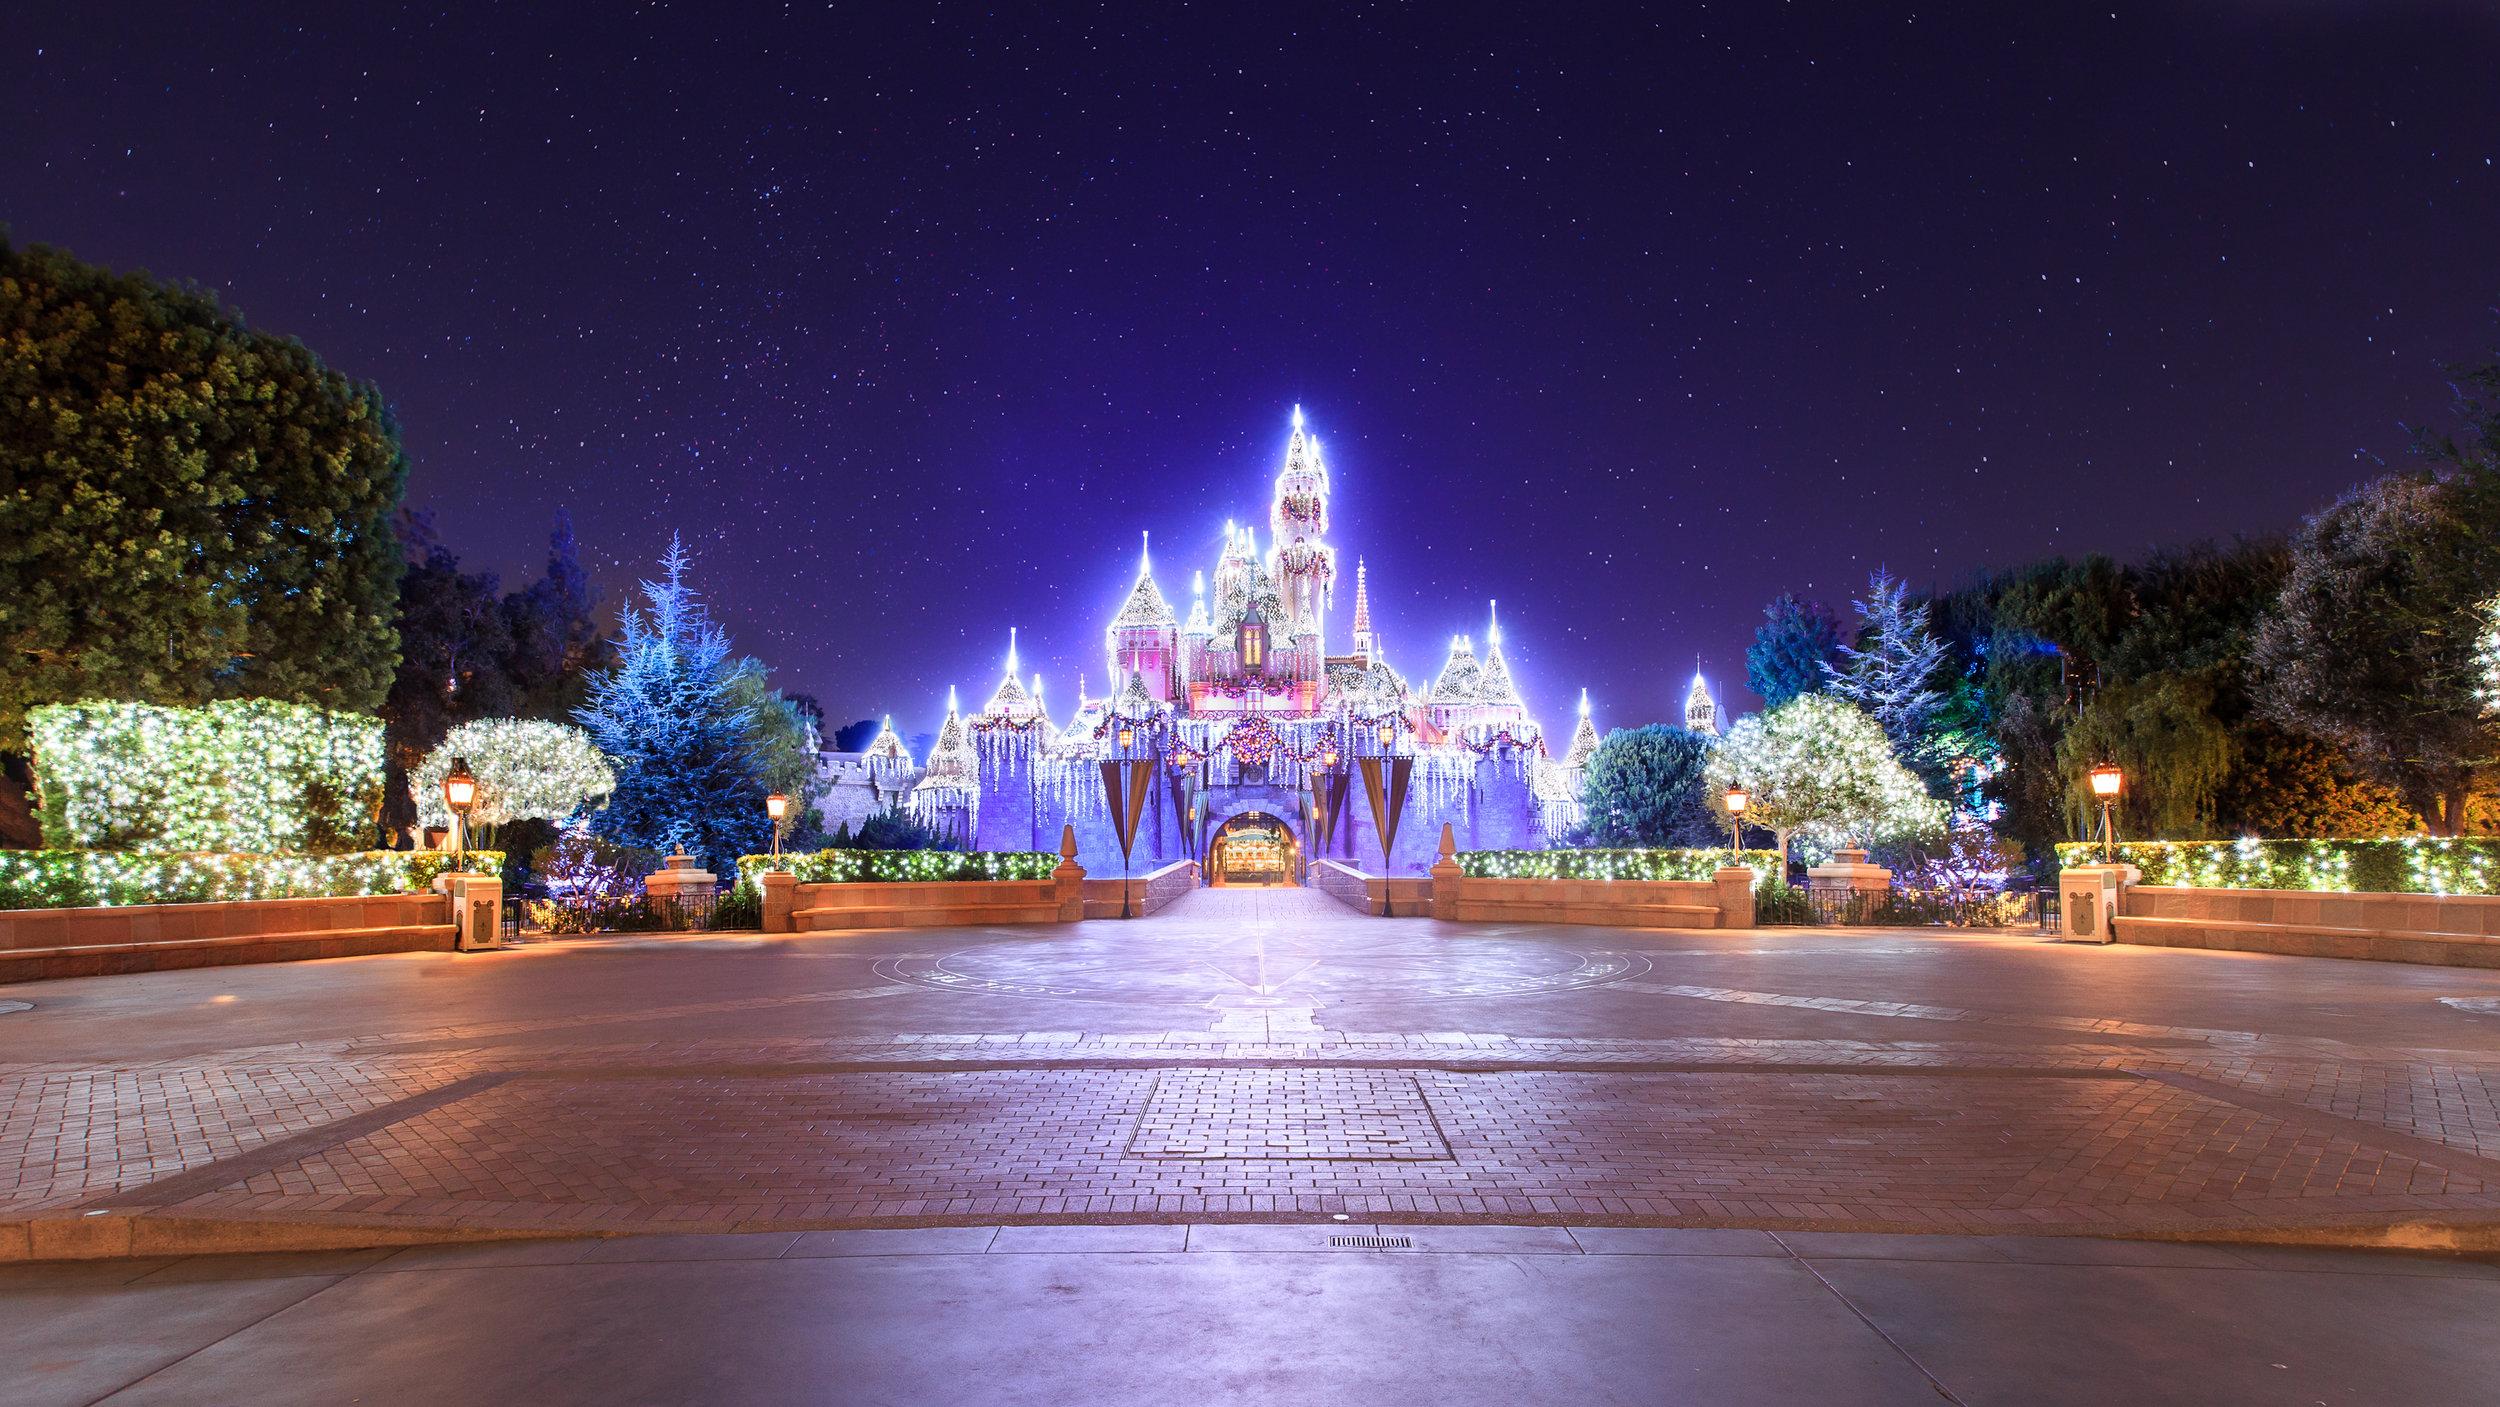 sleeping-beauty-castle-holidays-121112-0048_1.jpg